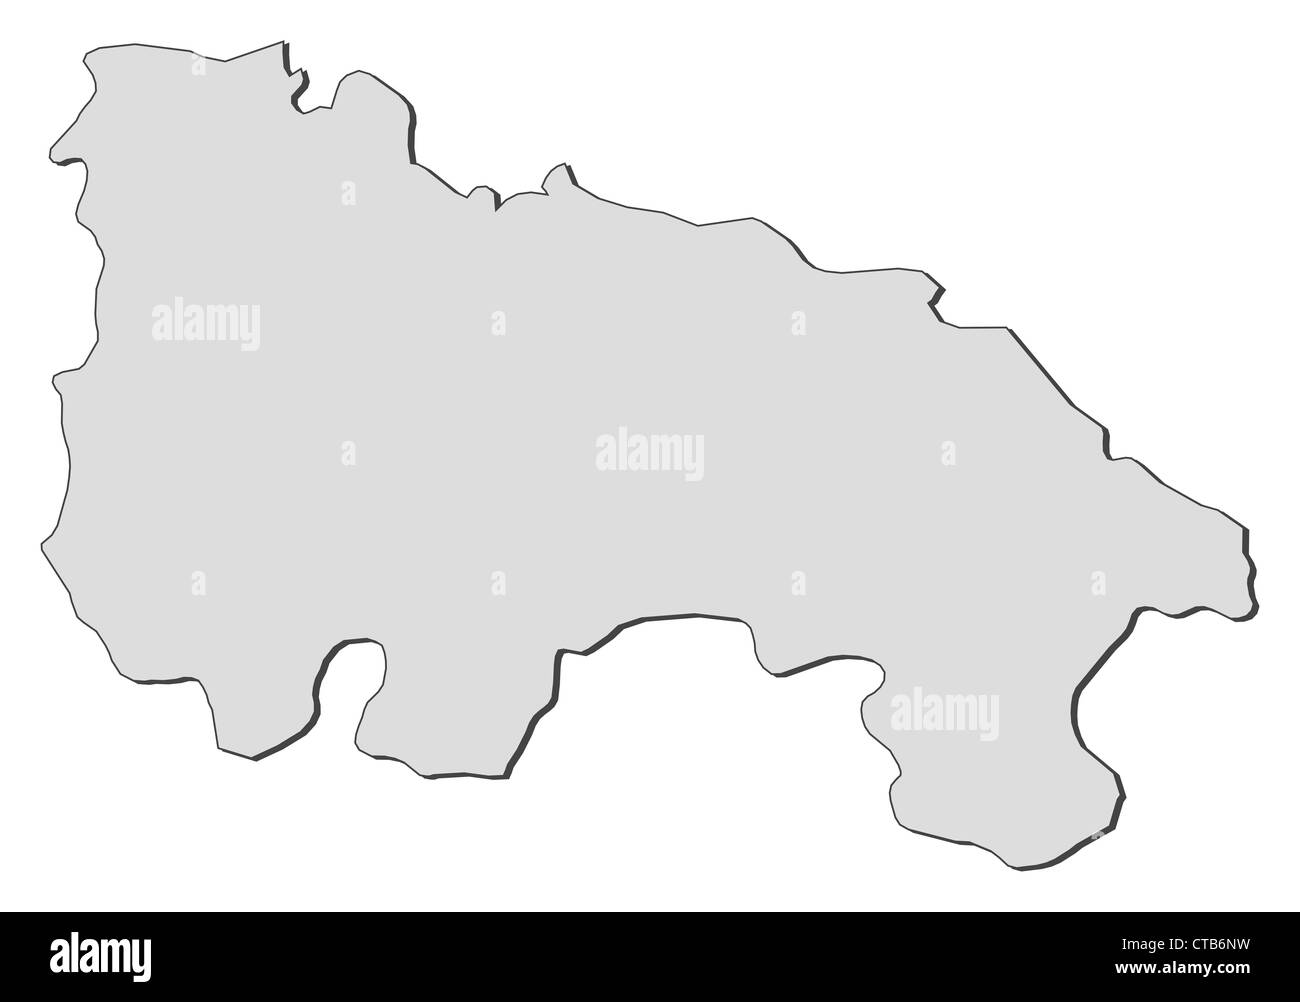 Map of La Rioja, a region of Spain. - Stock Image